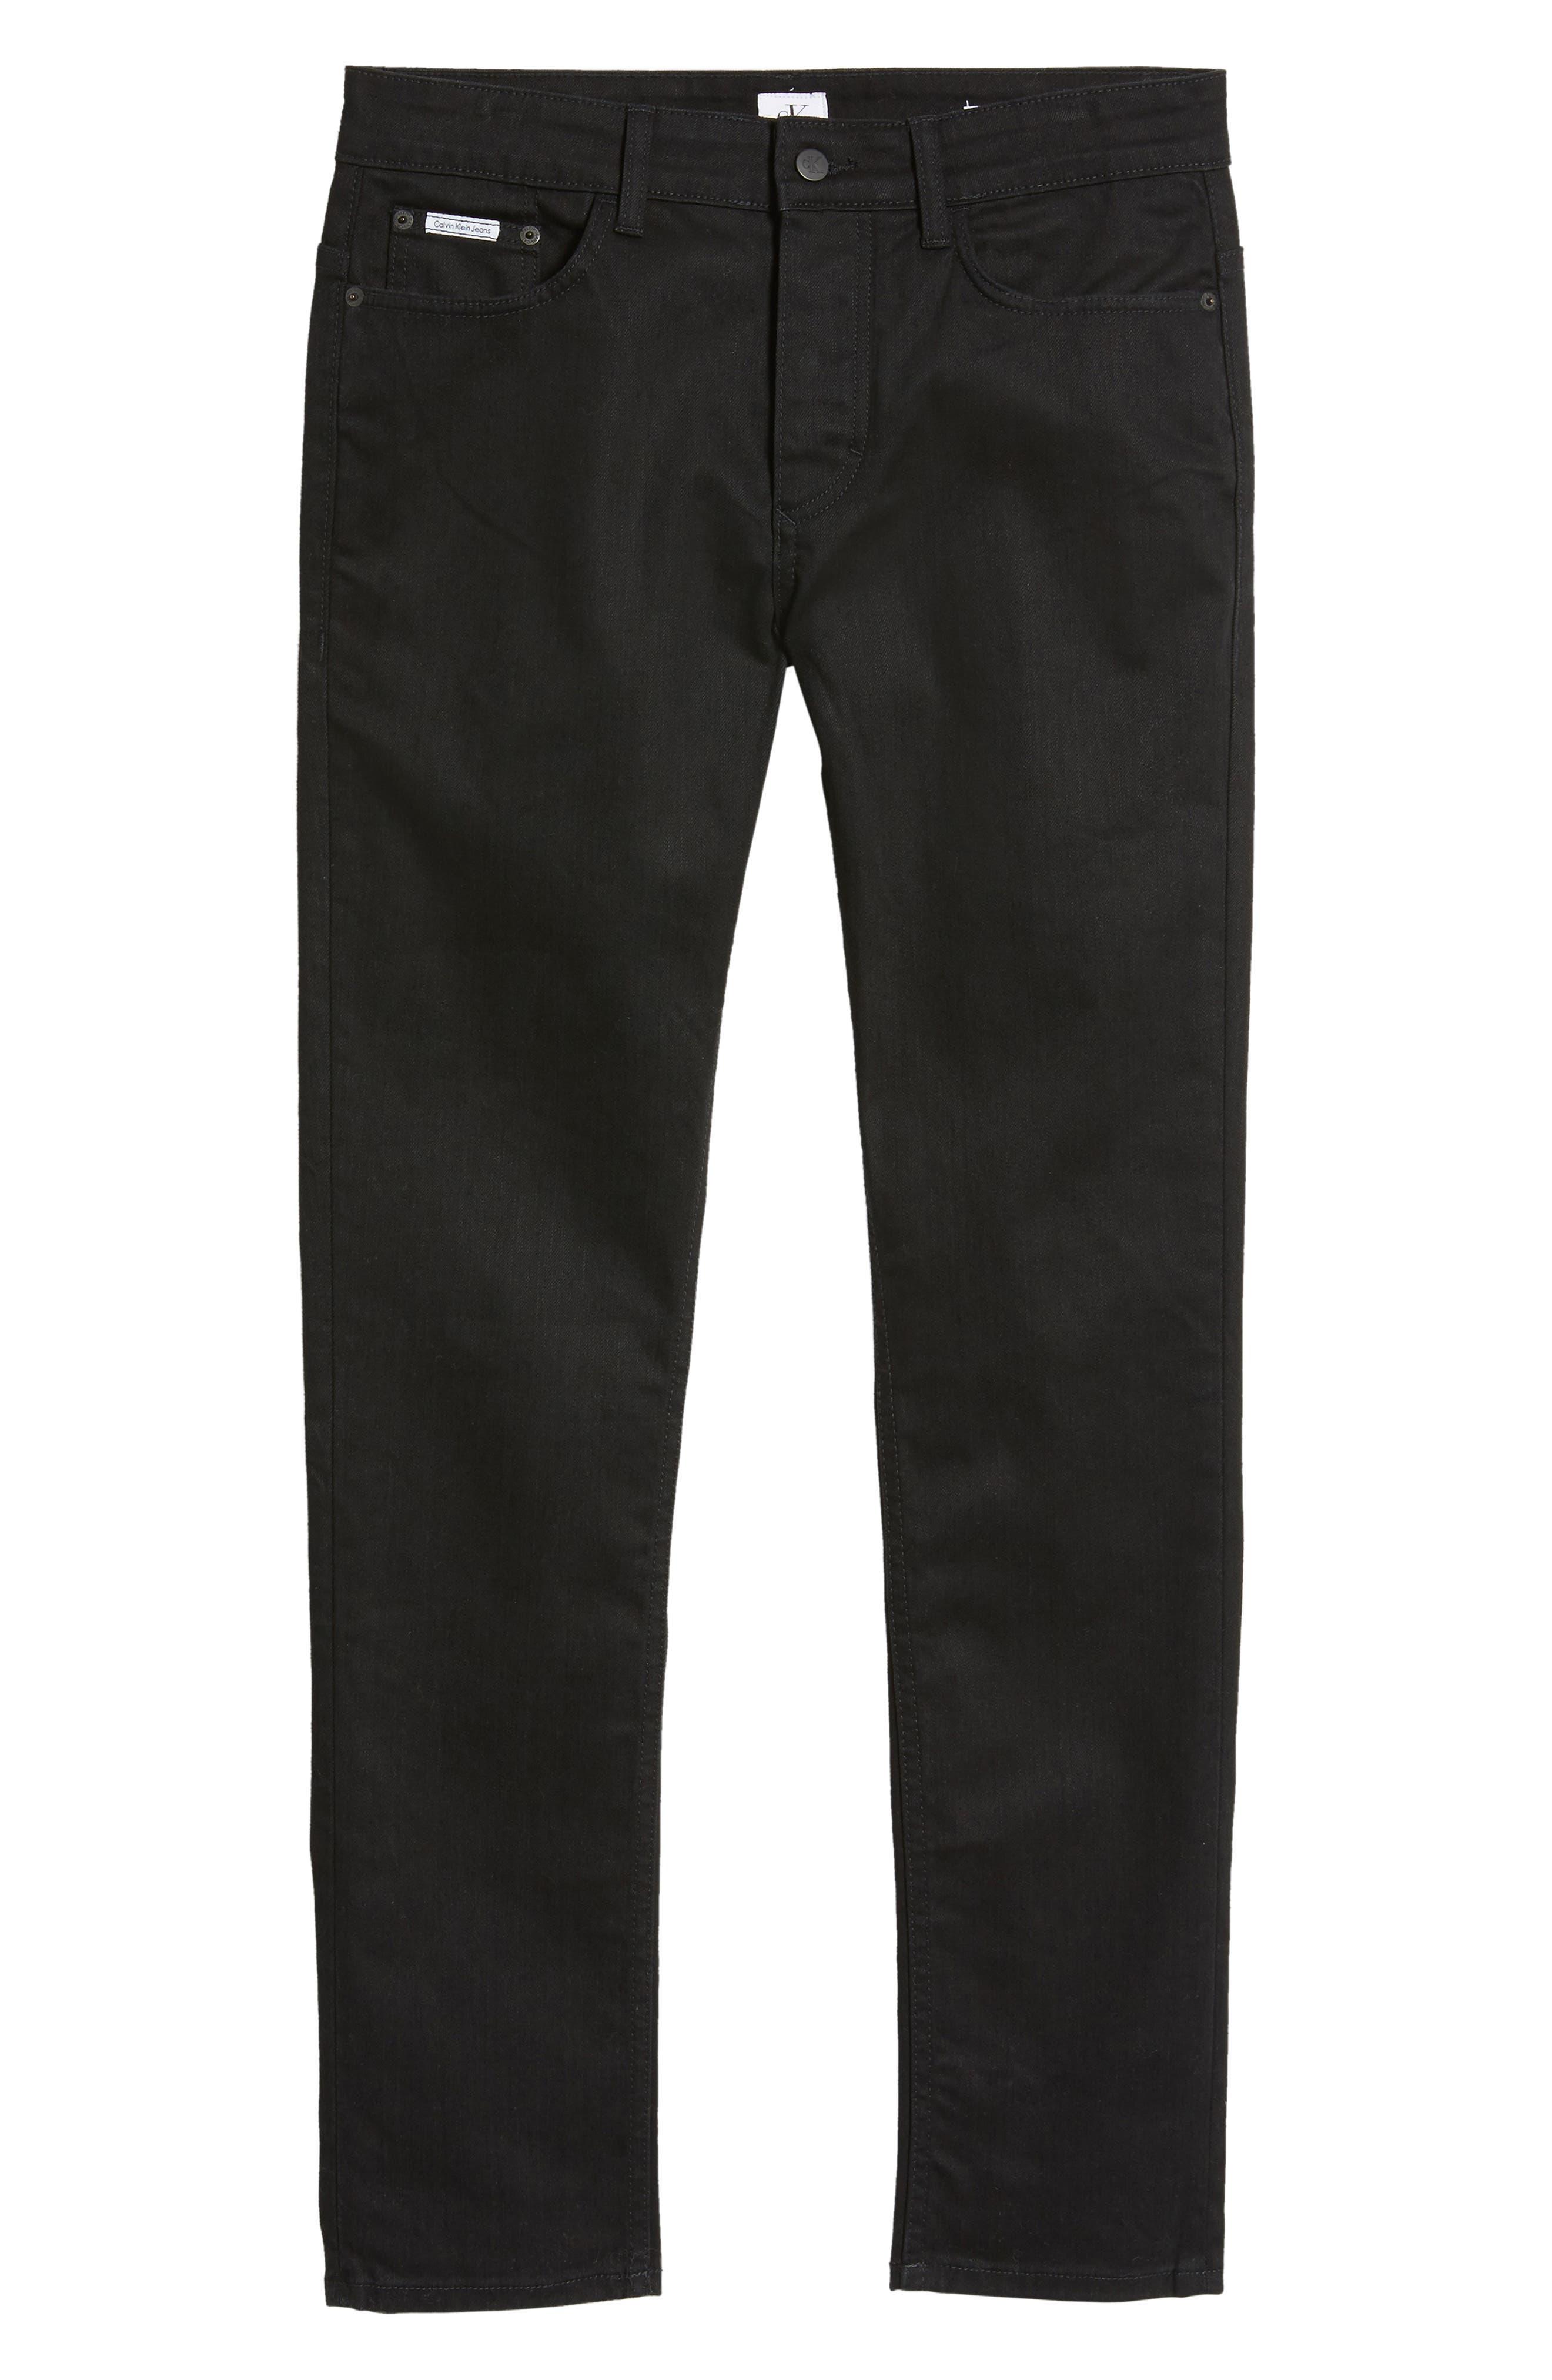 Skinny Jeans,                             Alternate thumbnail 6, color,                             010